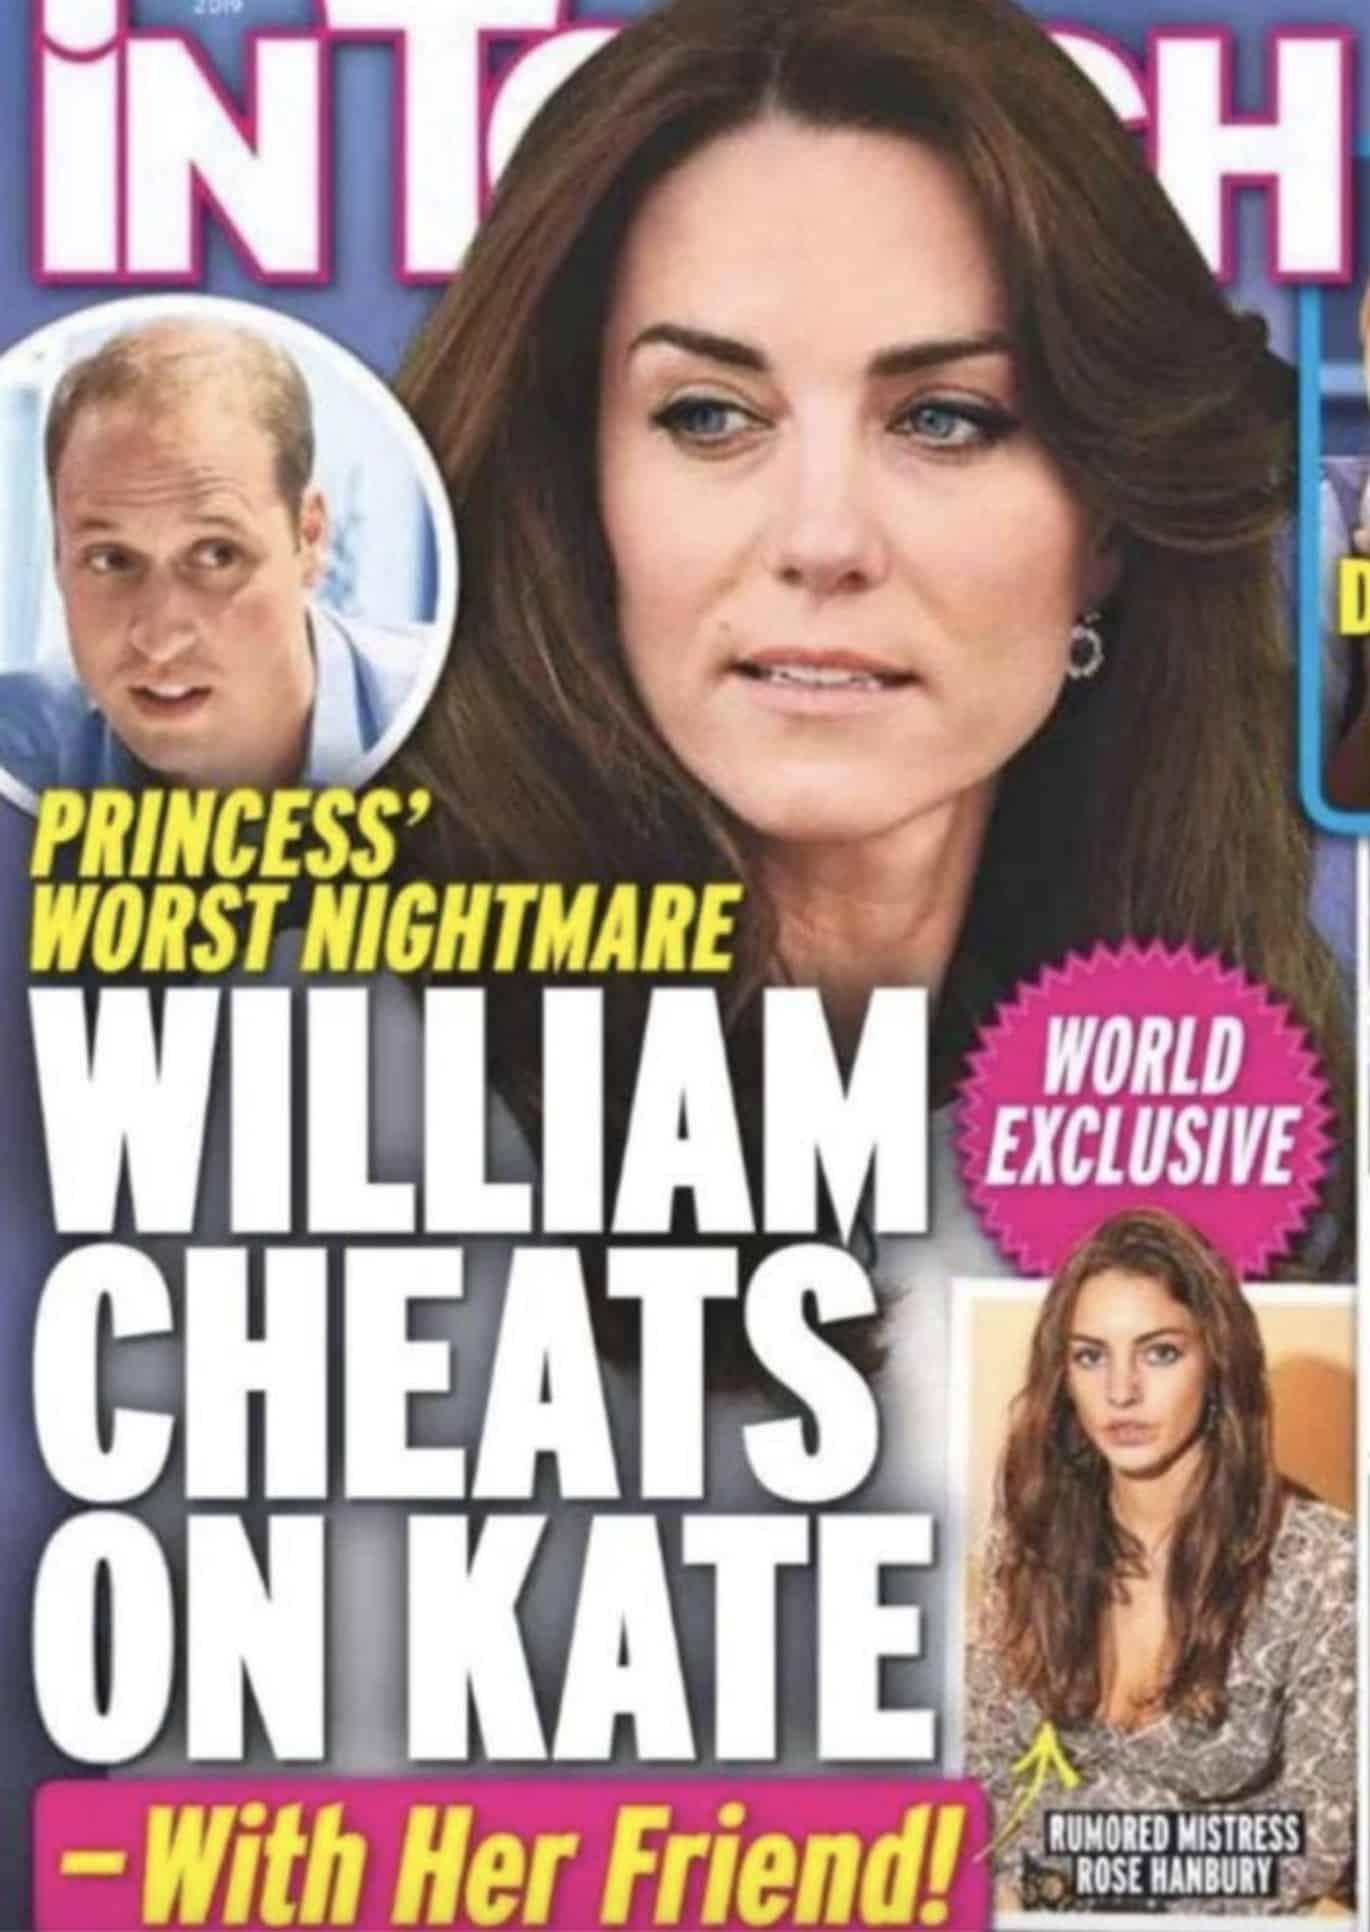 Photo of هل هي حقيقة ام مجرد شائعة خيانة الامير وليام لزوجته كيت مع صديقتها ؟